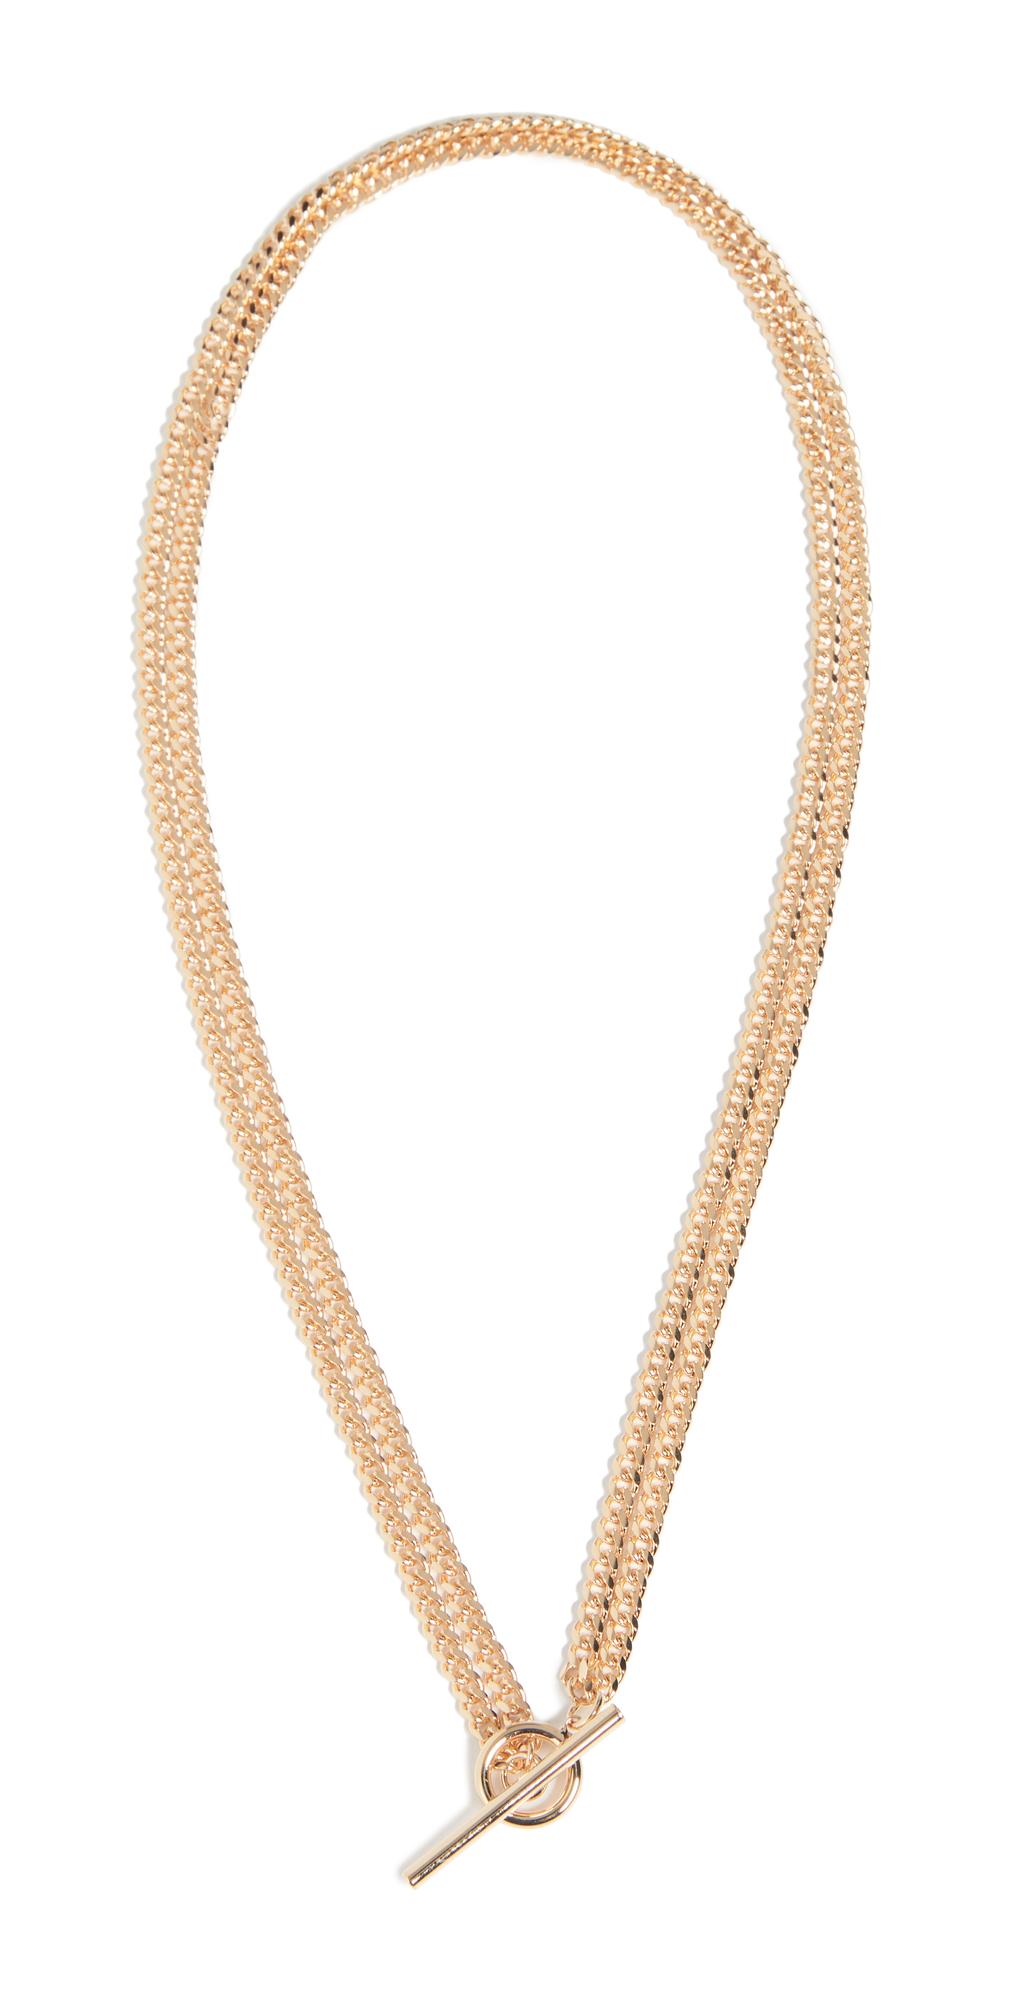 Board Necklace